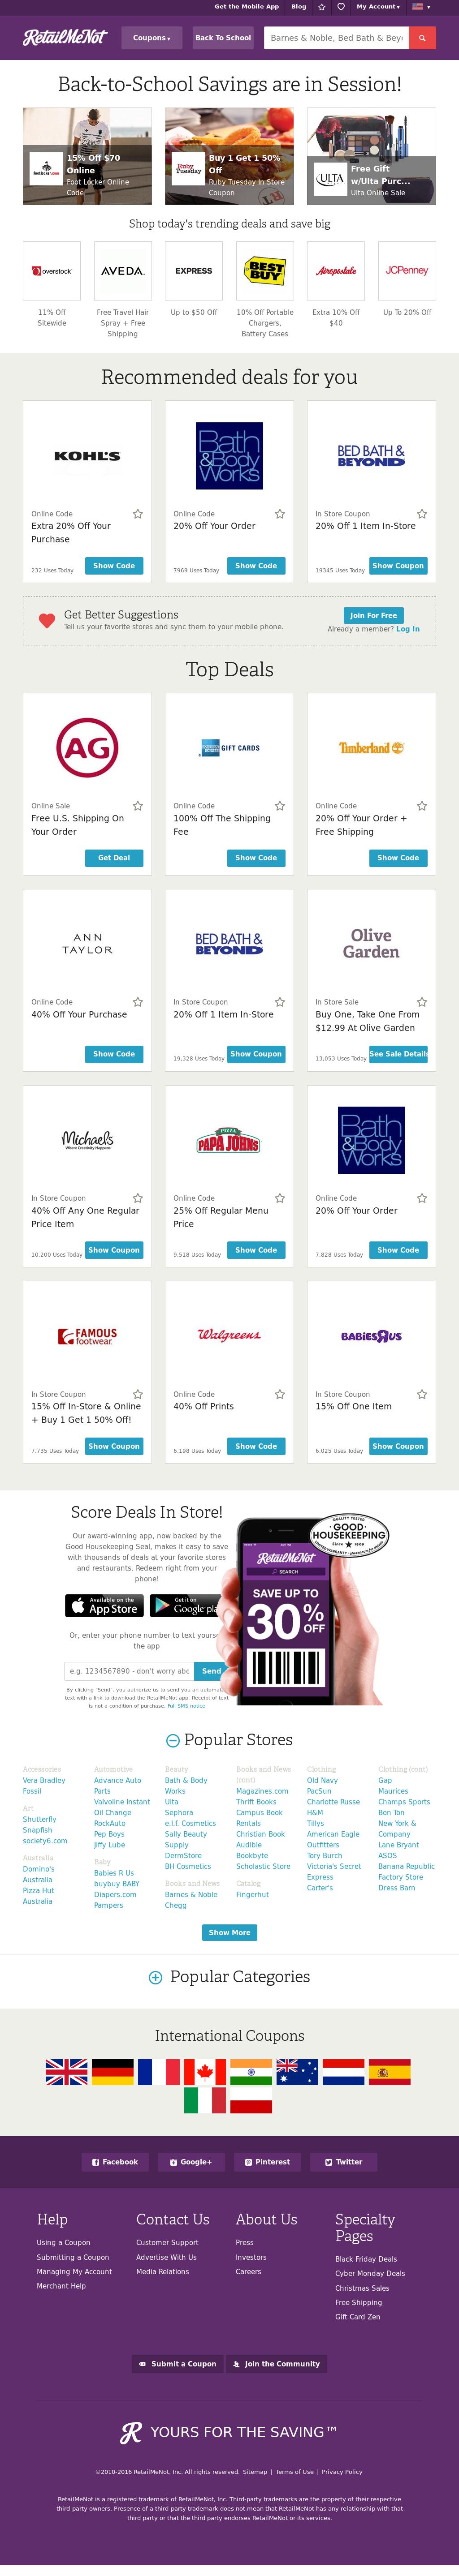 RetailMeNot Competitors, Revenue and Employees - Owler